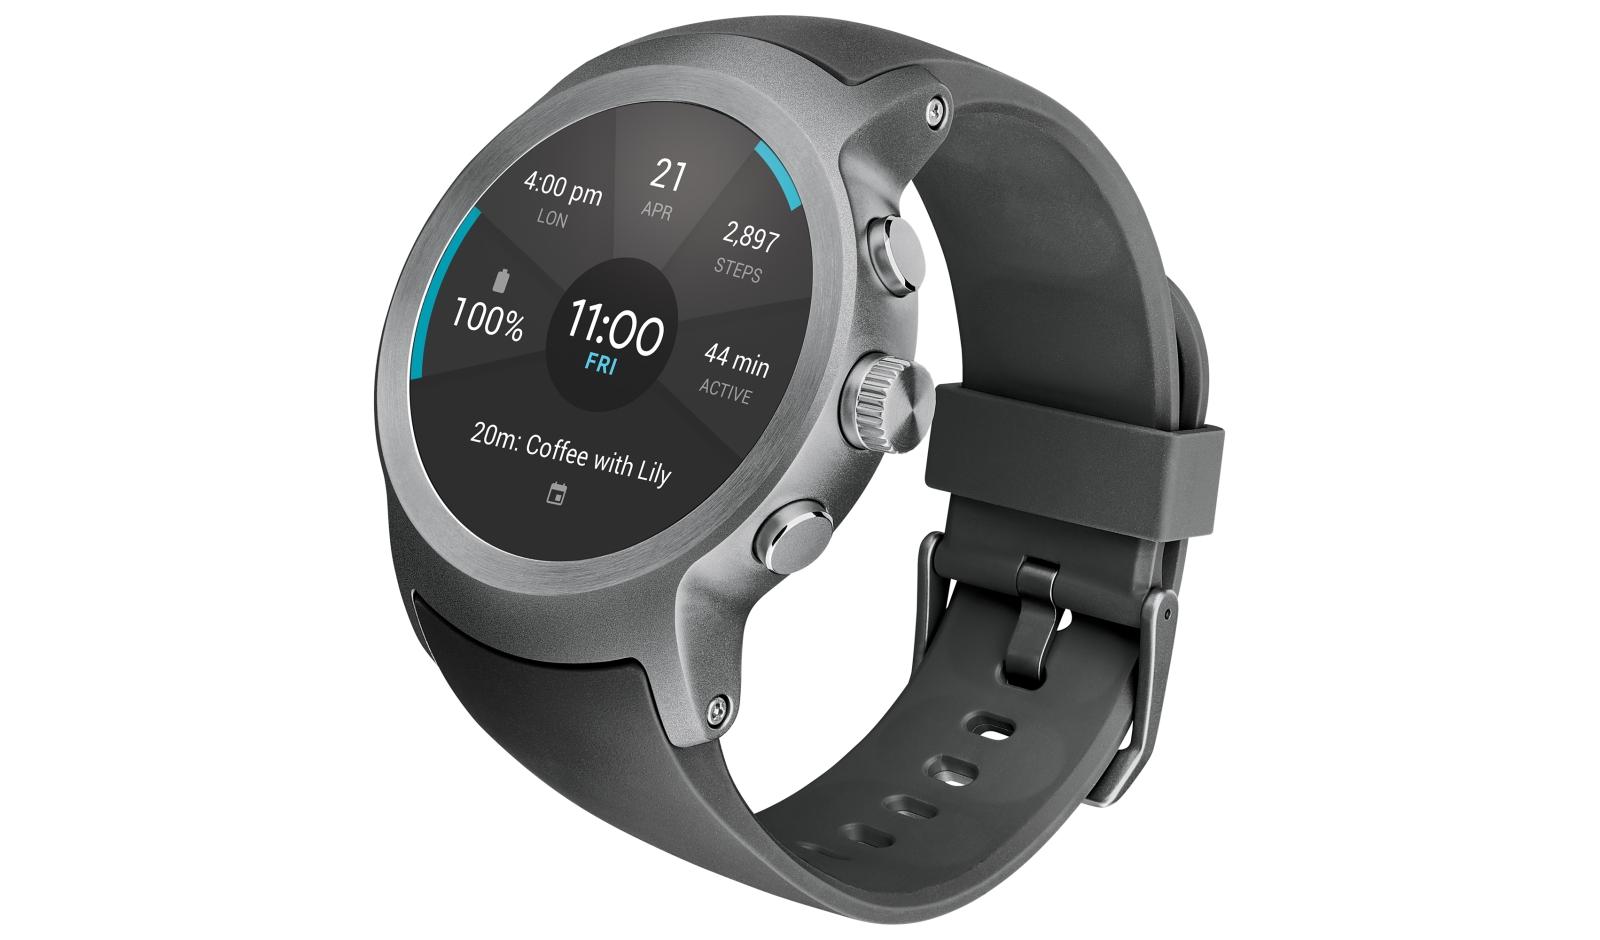 neue hybrid smartwatch von lg soll hundert tage. Black Bedroom Furniture Sets. Home Design Ideas